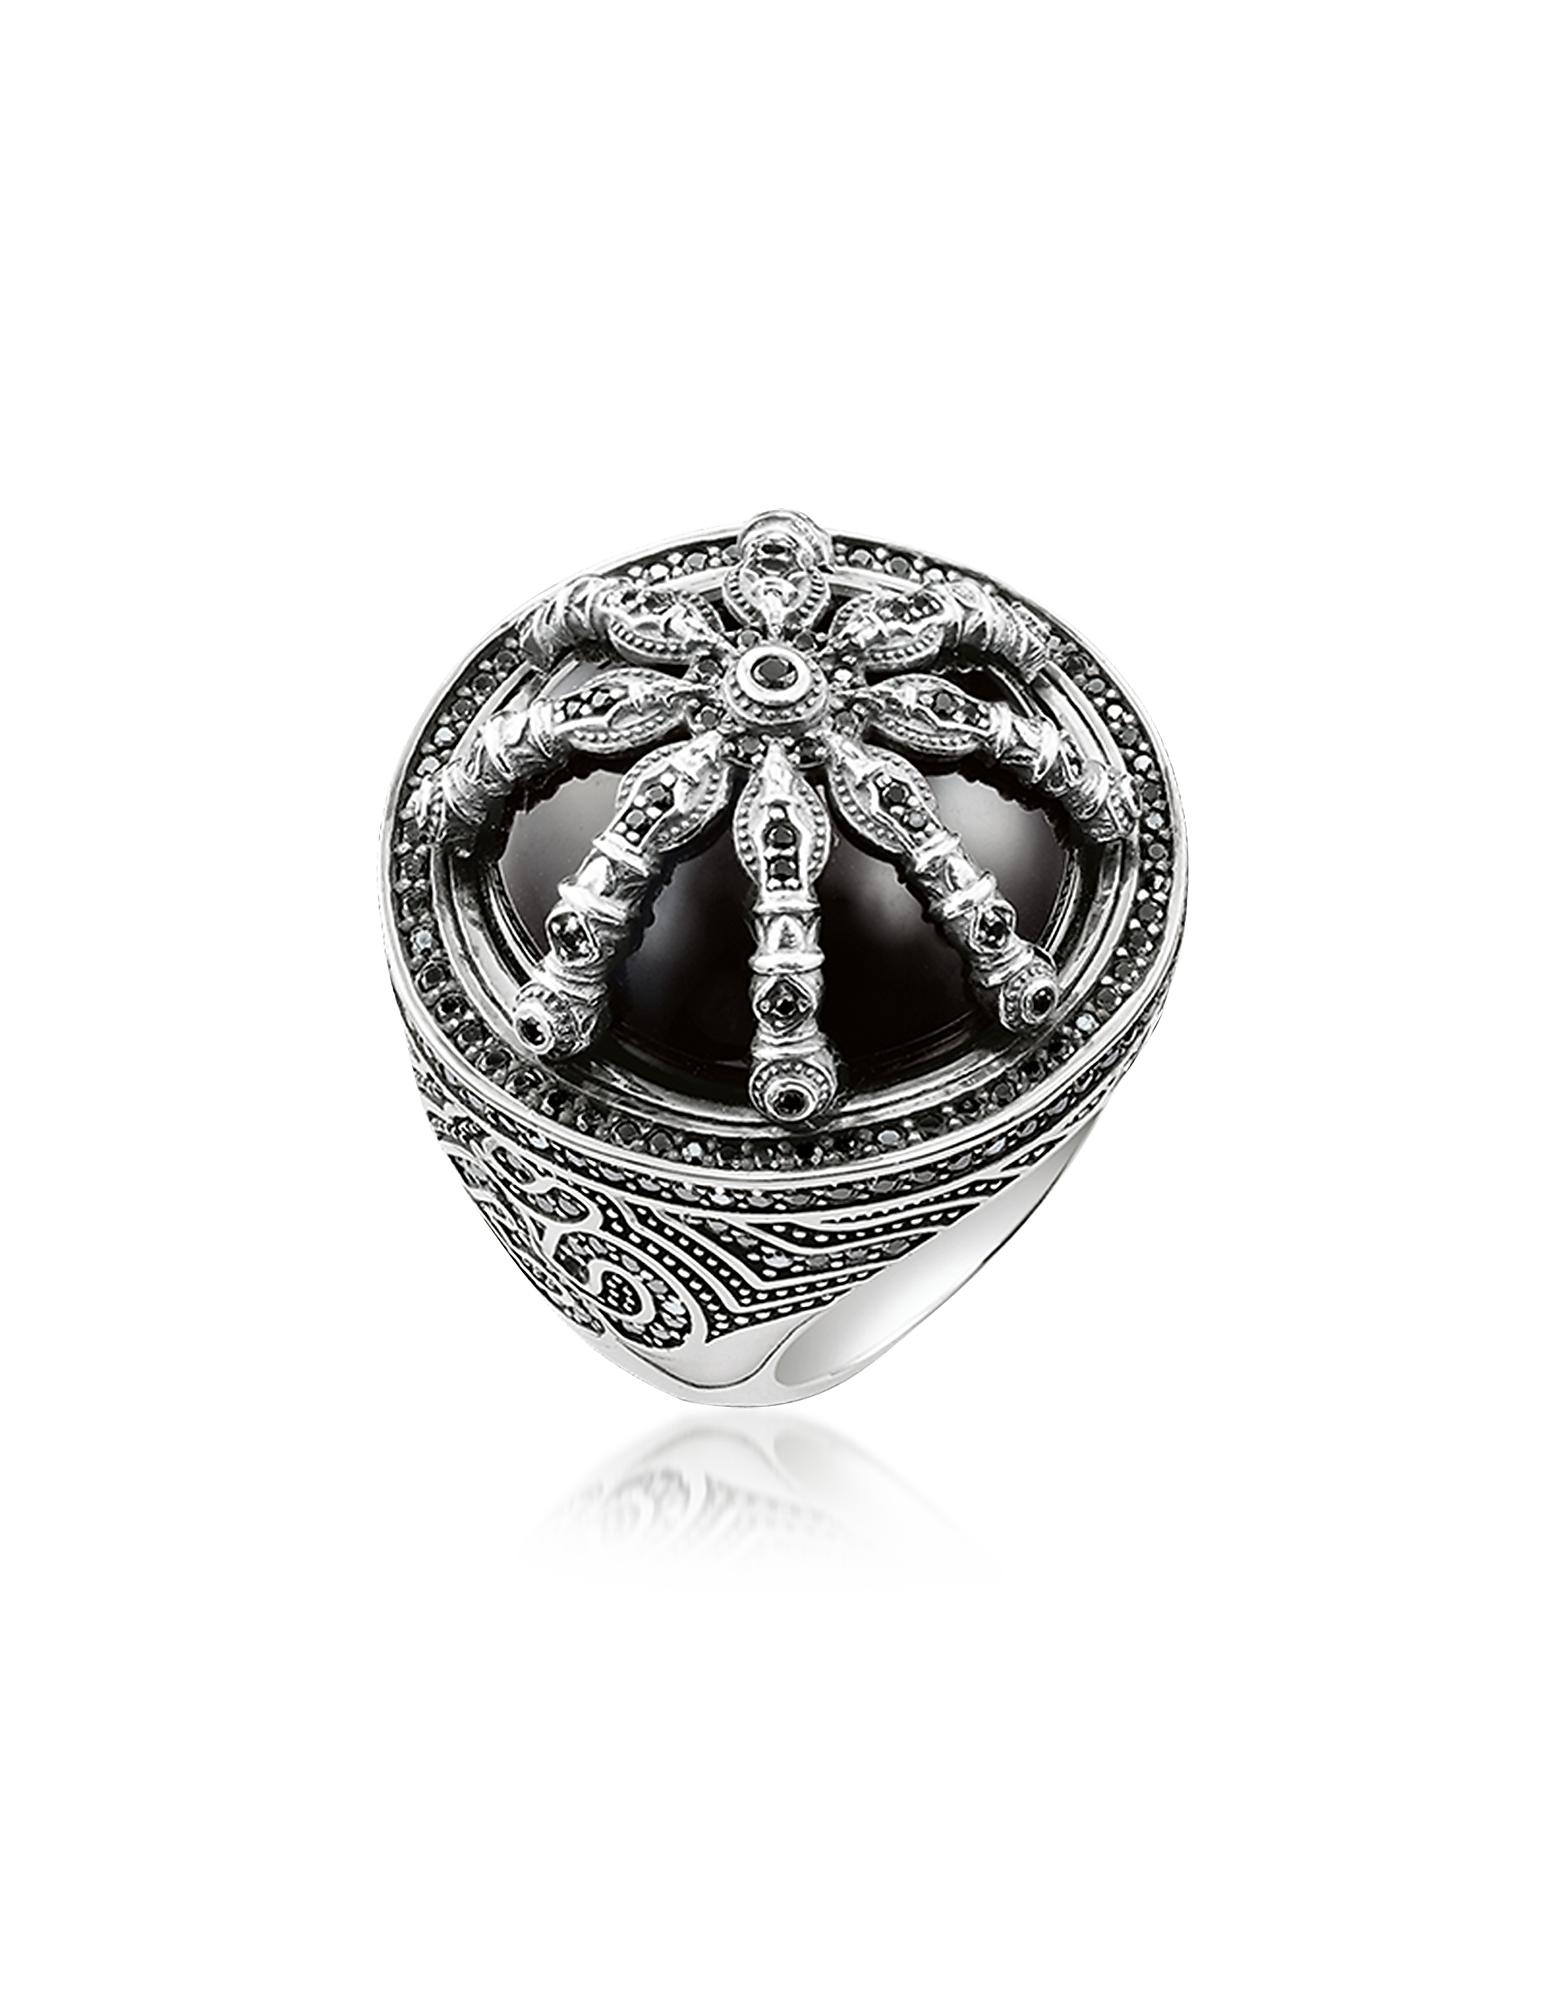 Thomas Sabo Rings, Blackened Sterling Silver Ring w/Black Zirconia and Onyx